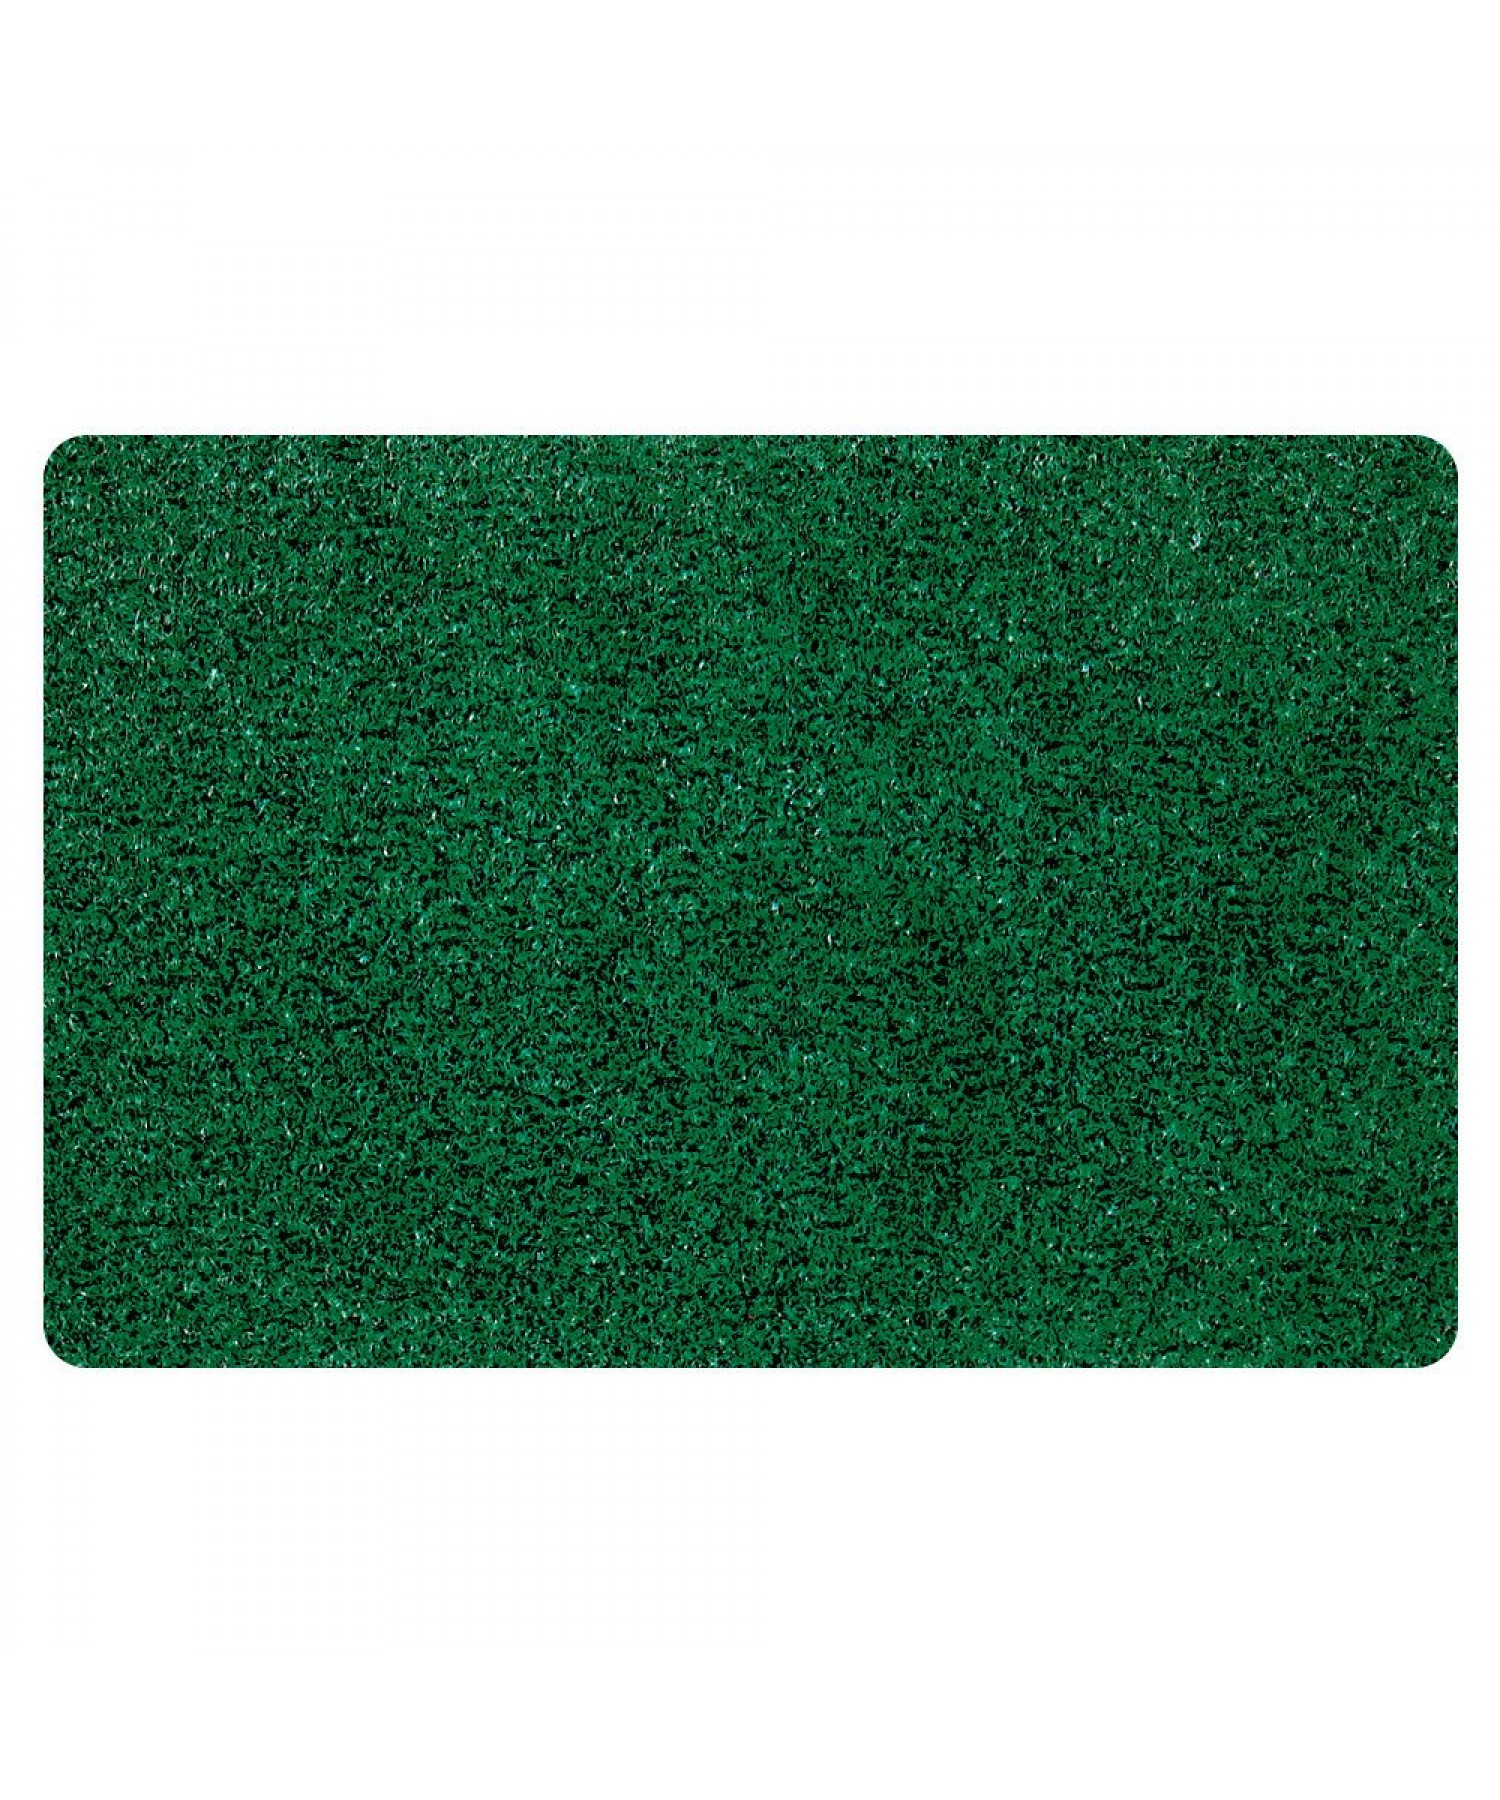 CUSHION DOORMAT, GREEN/BLACK 46 X 76 CM